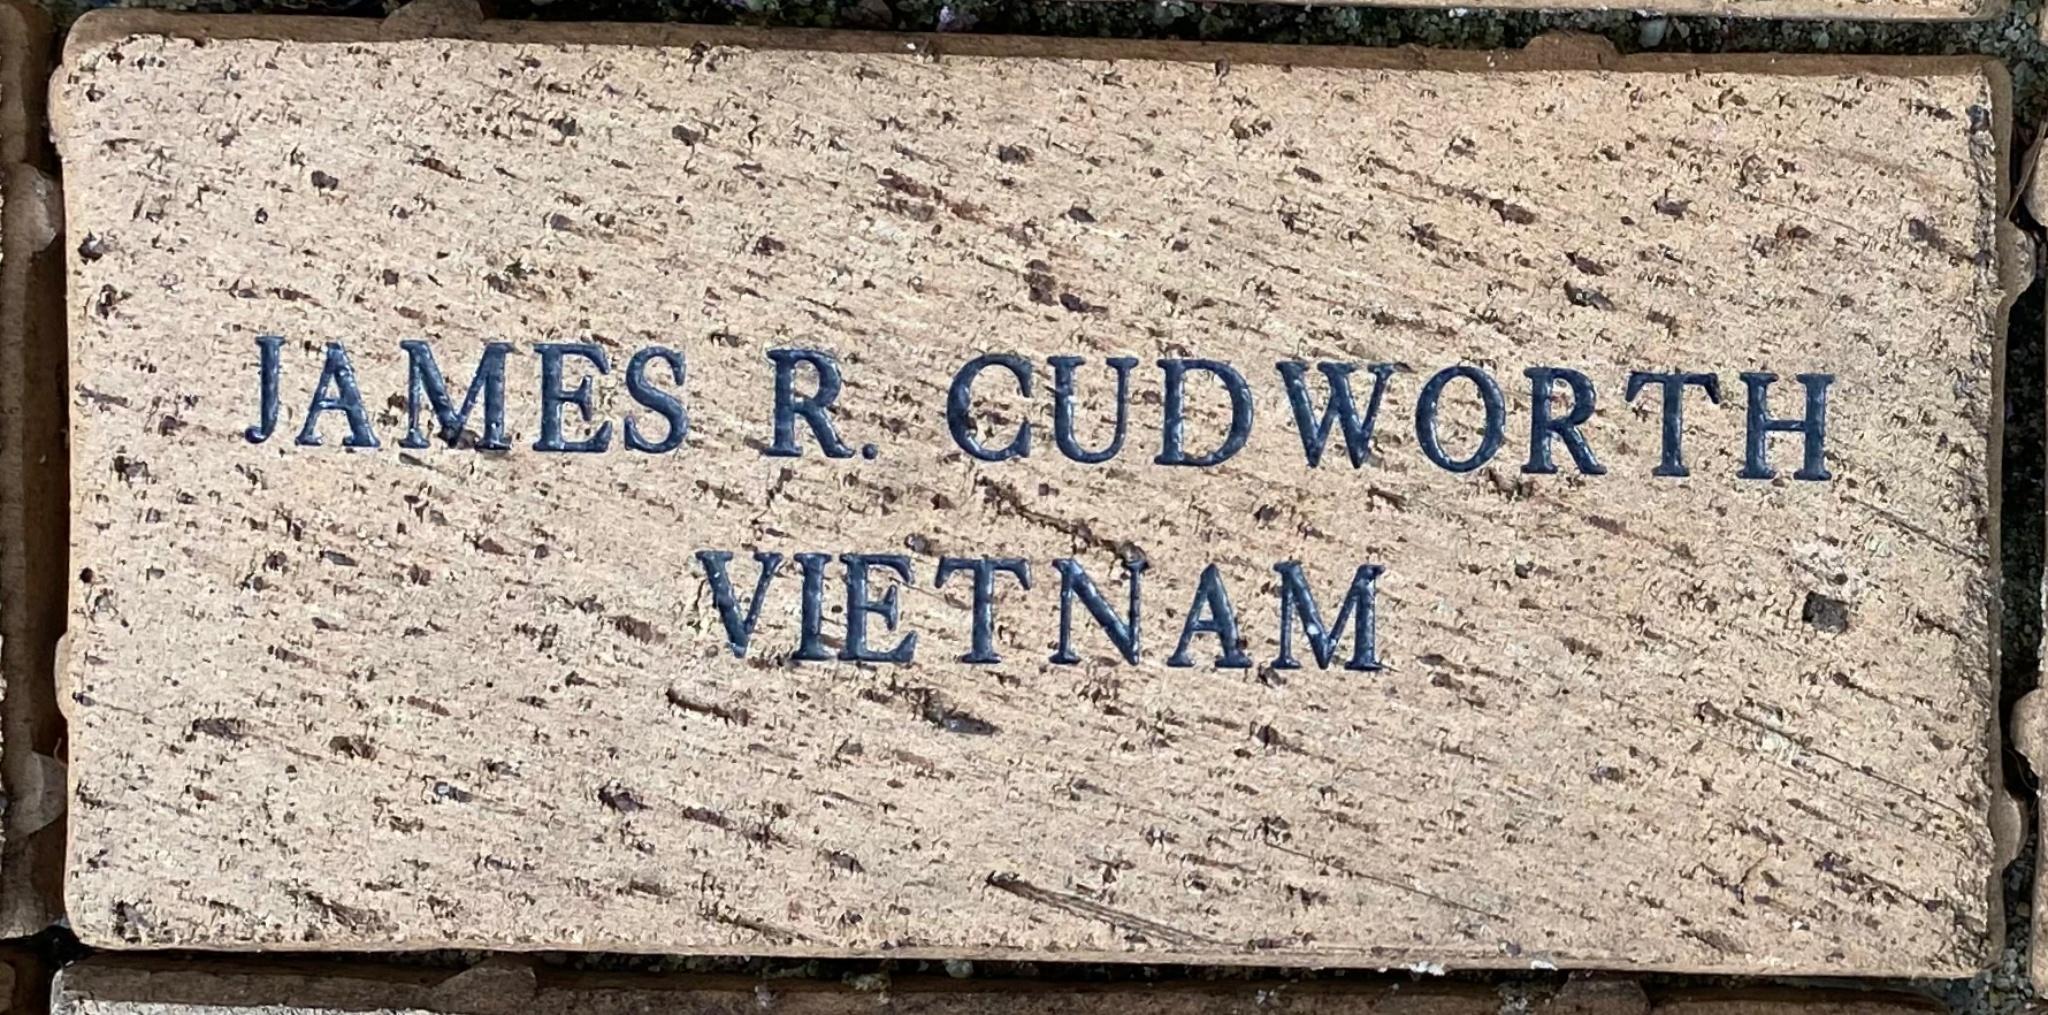 JAMES R. CUDWORTH VIETNAM